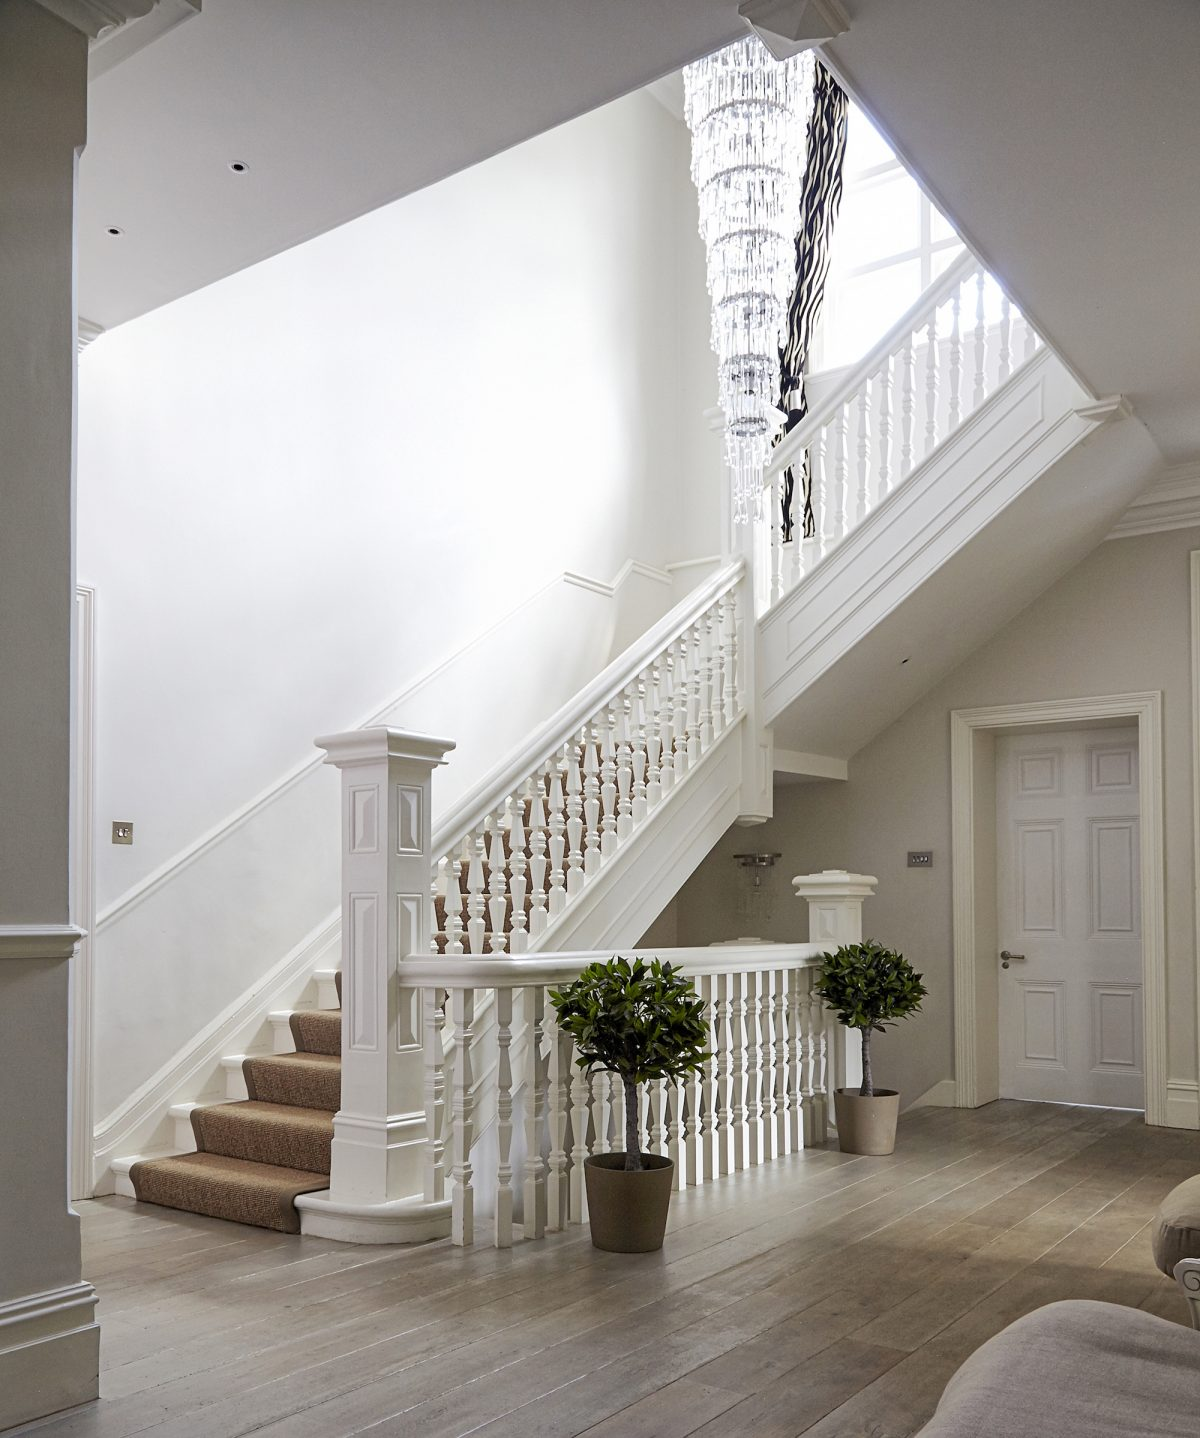 Wimbledon SW19 - atrium - london houses - shootfactory location